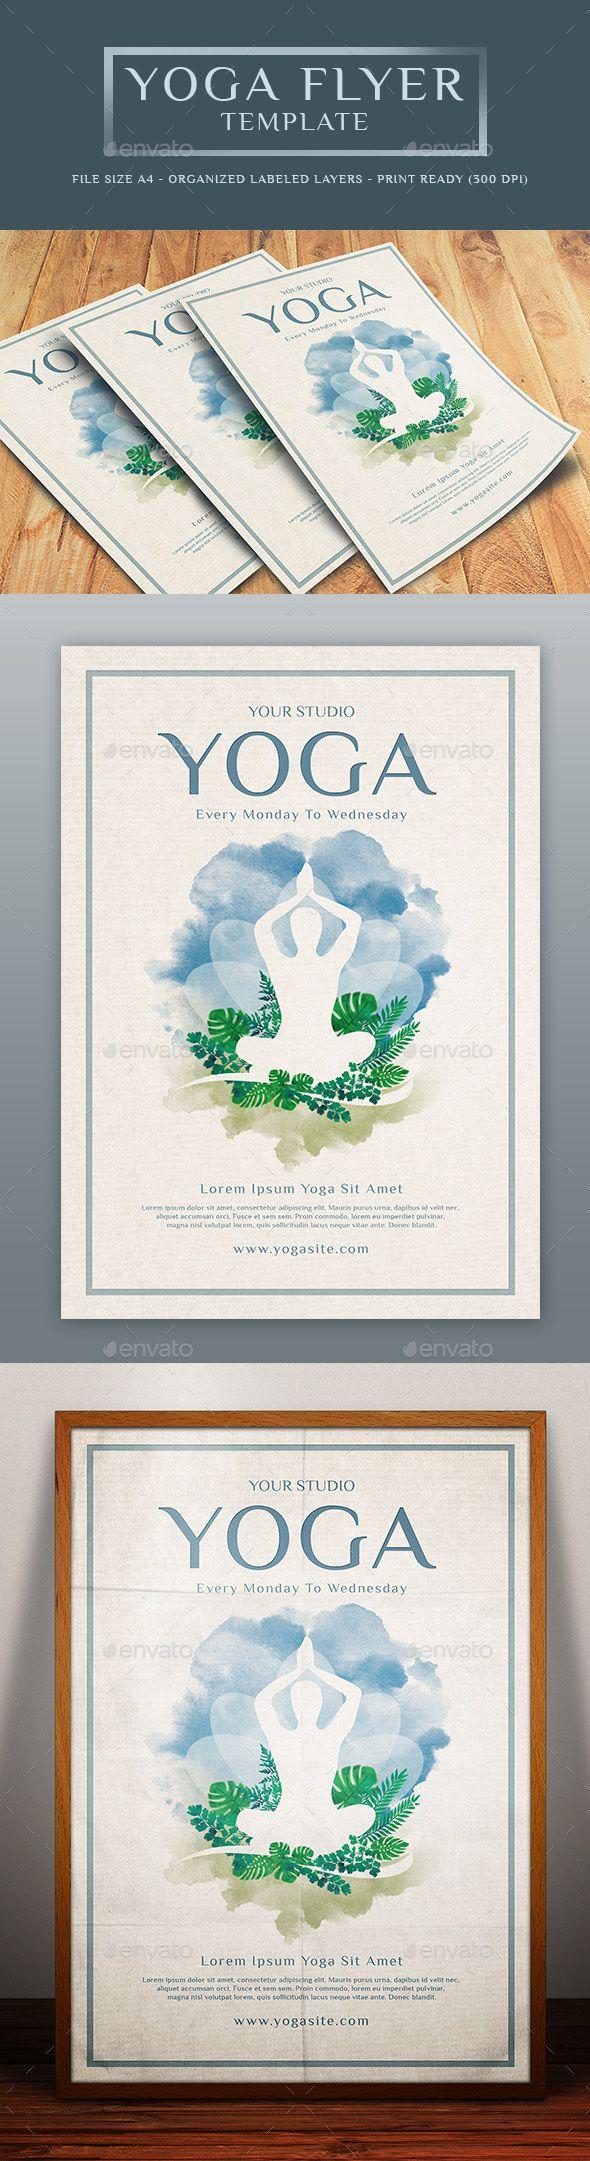 Yoga Flyer Template Psd Graphic Design Pinterest Yoga Flyer